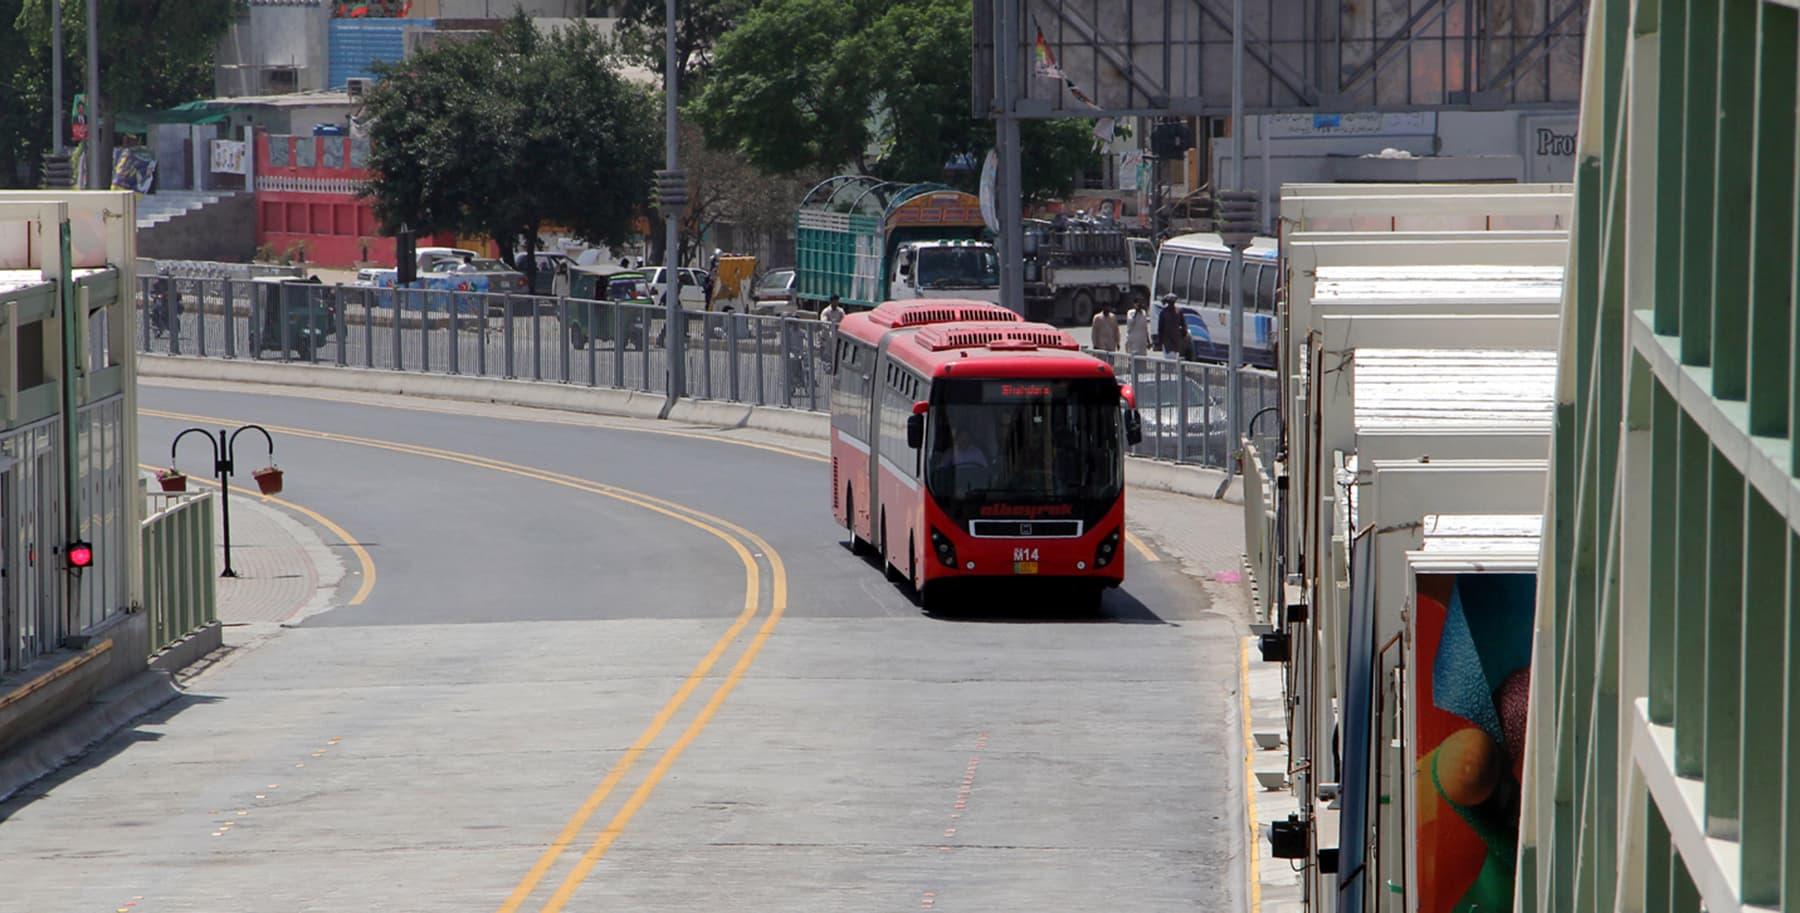 میٹرو بس لاہور—فوٹو عبیداللہ کیہر